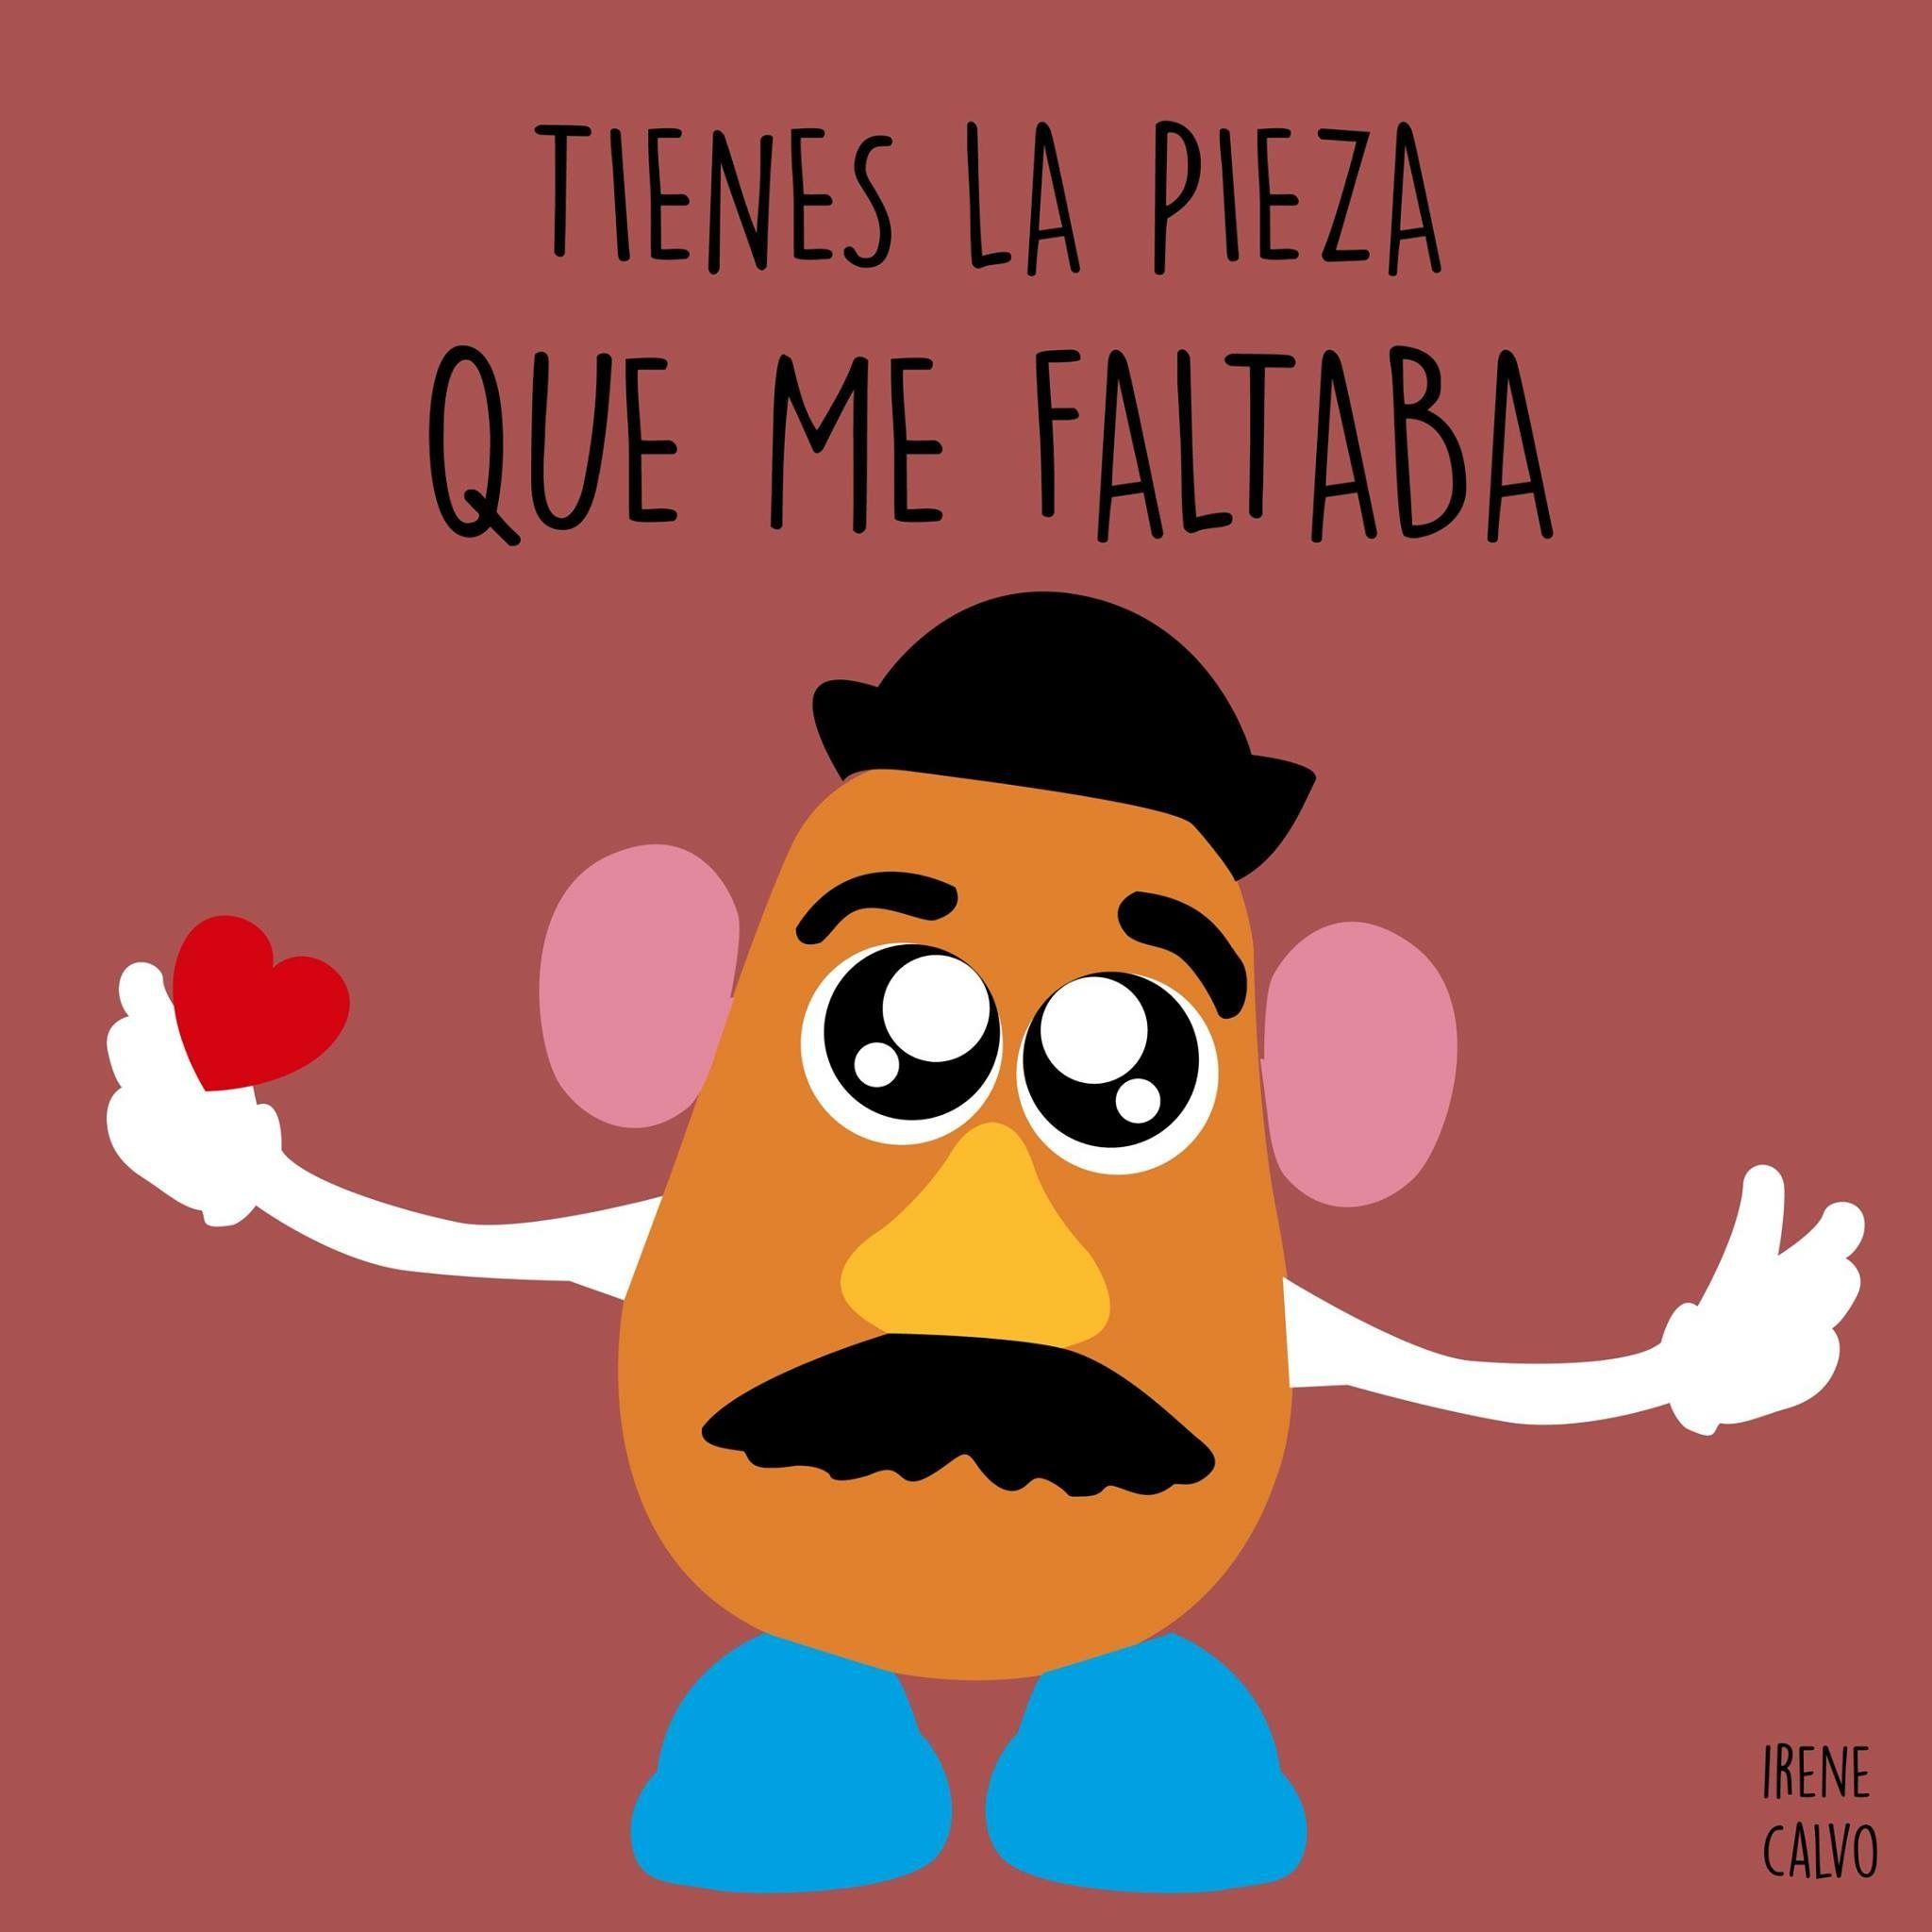 Geek Stuff Superheroes Mr Wonderful Cultura Pop Searching Spanish Quotes Emojis Love Favorite Quotes